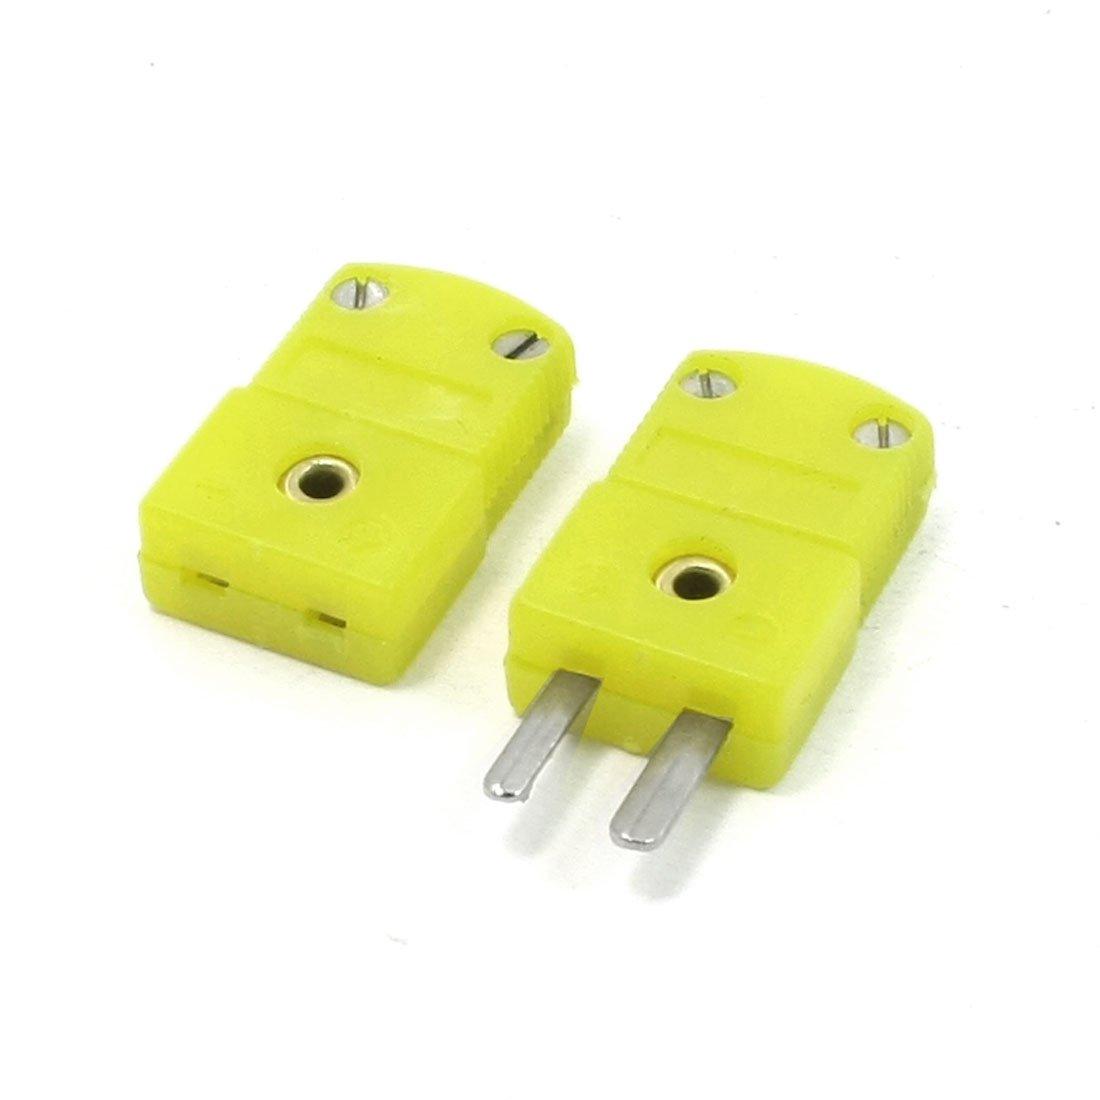 Gelb Kunststoff Shell Typ K Thermoelement Steckdose Stecker Set ...